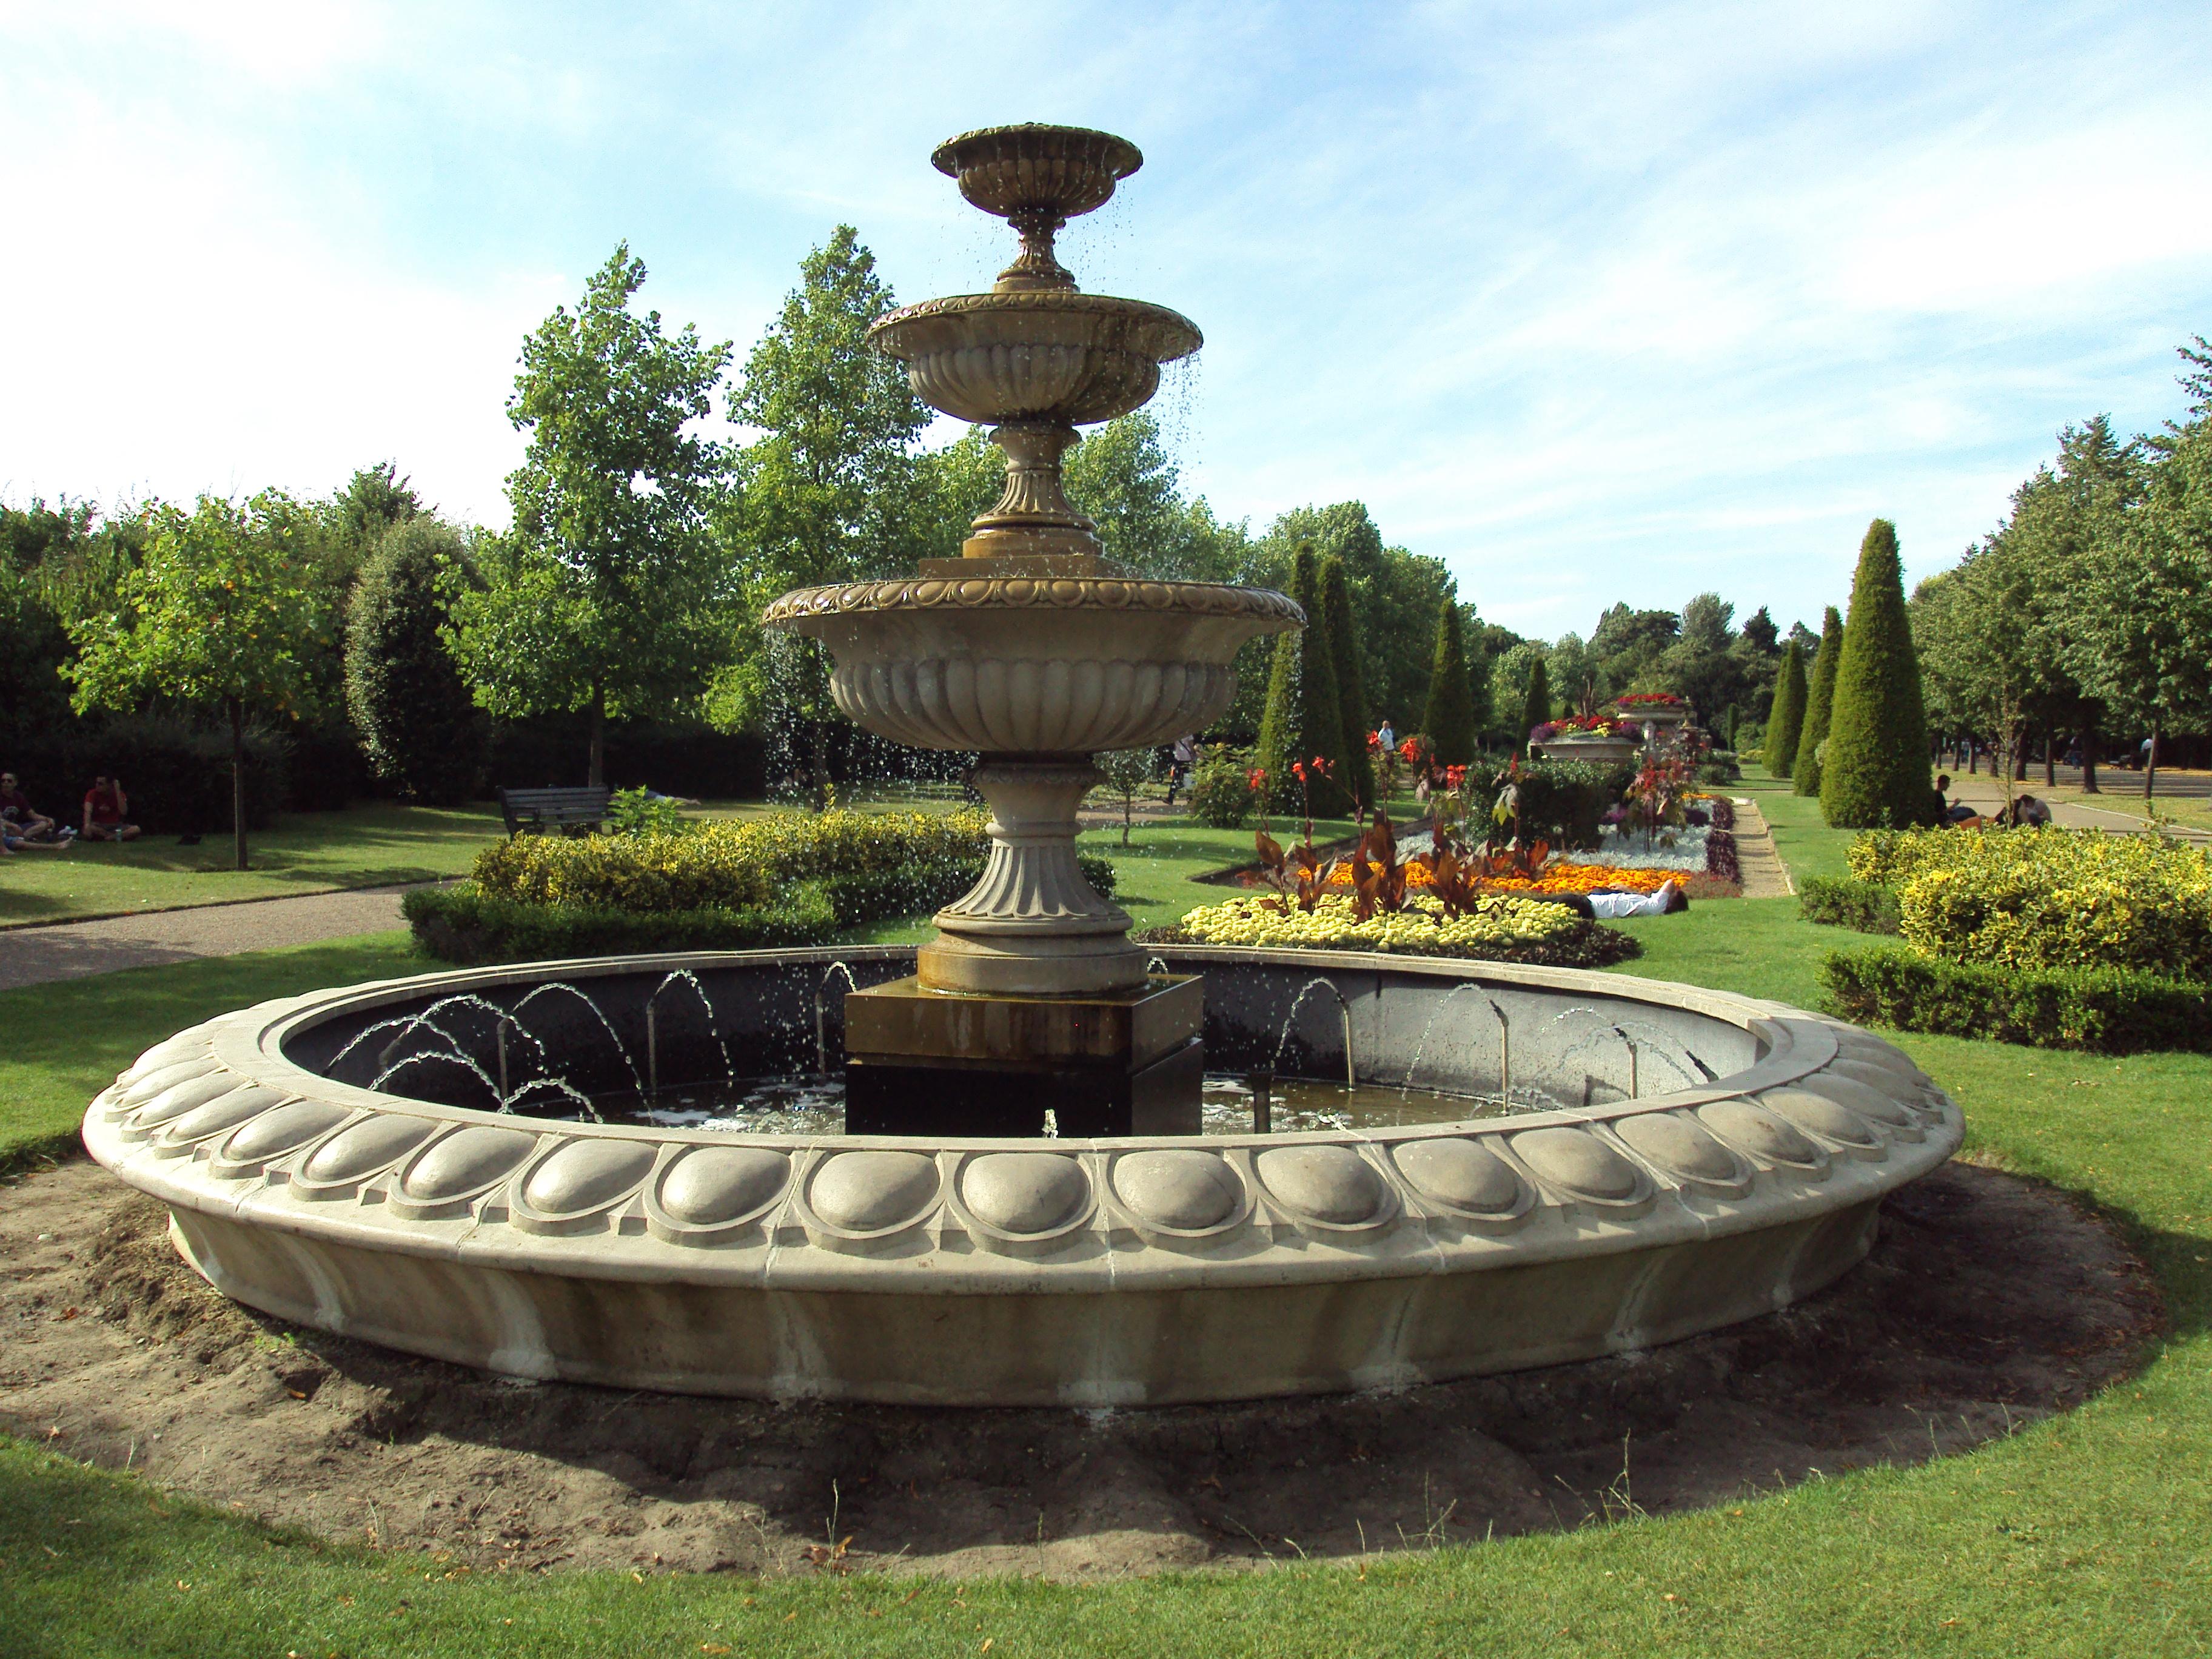 File:Fountain, Regent's Park, London - DSC07045.JPG ...